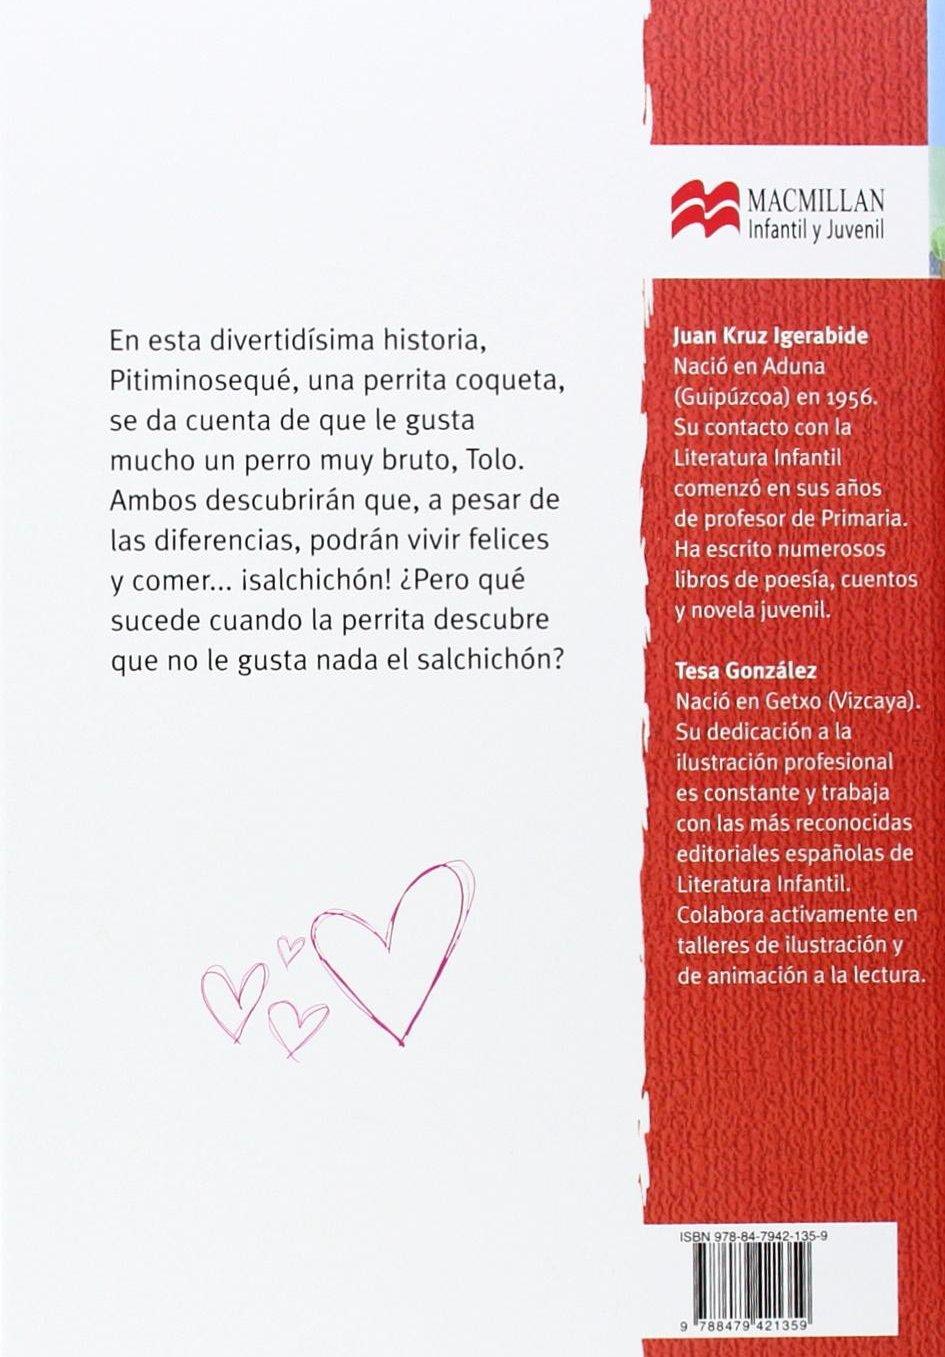 Amazon.com: Querido Tolo (Librosaurio) (Spanish Edition) (9788479421359): Juan Kruz Igerabide, Tesa González: Books